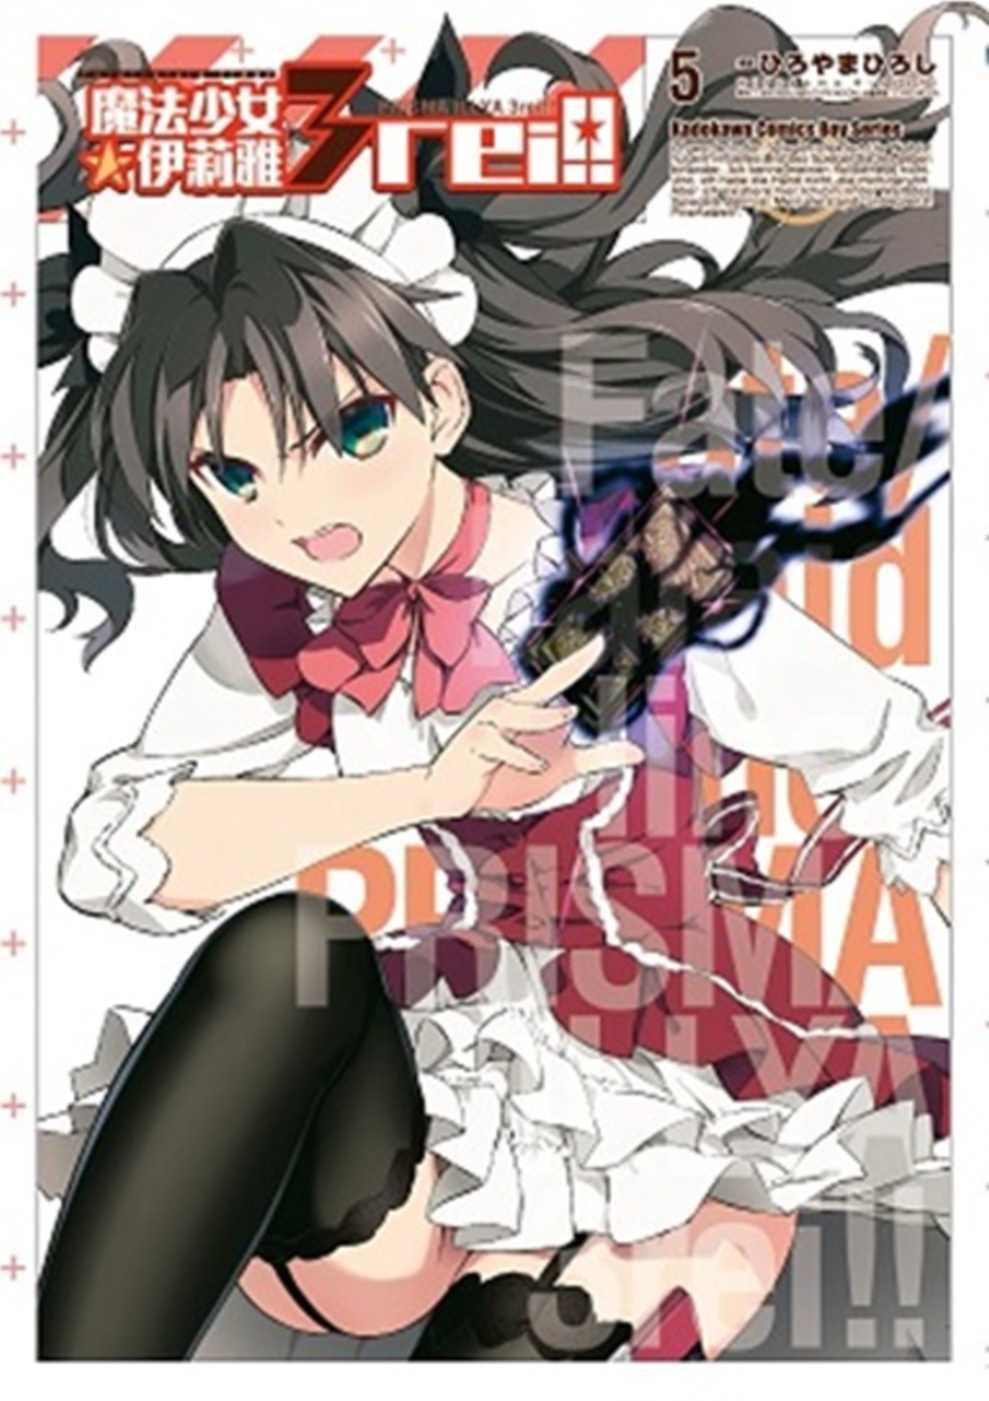 Fate kaleid liner 魔法少女~伊莉雅3rei^!^! ^(5^)